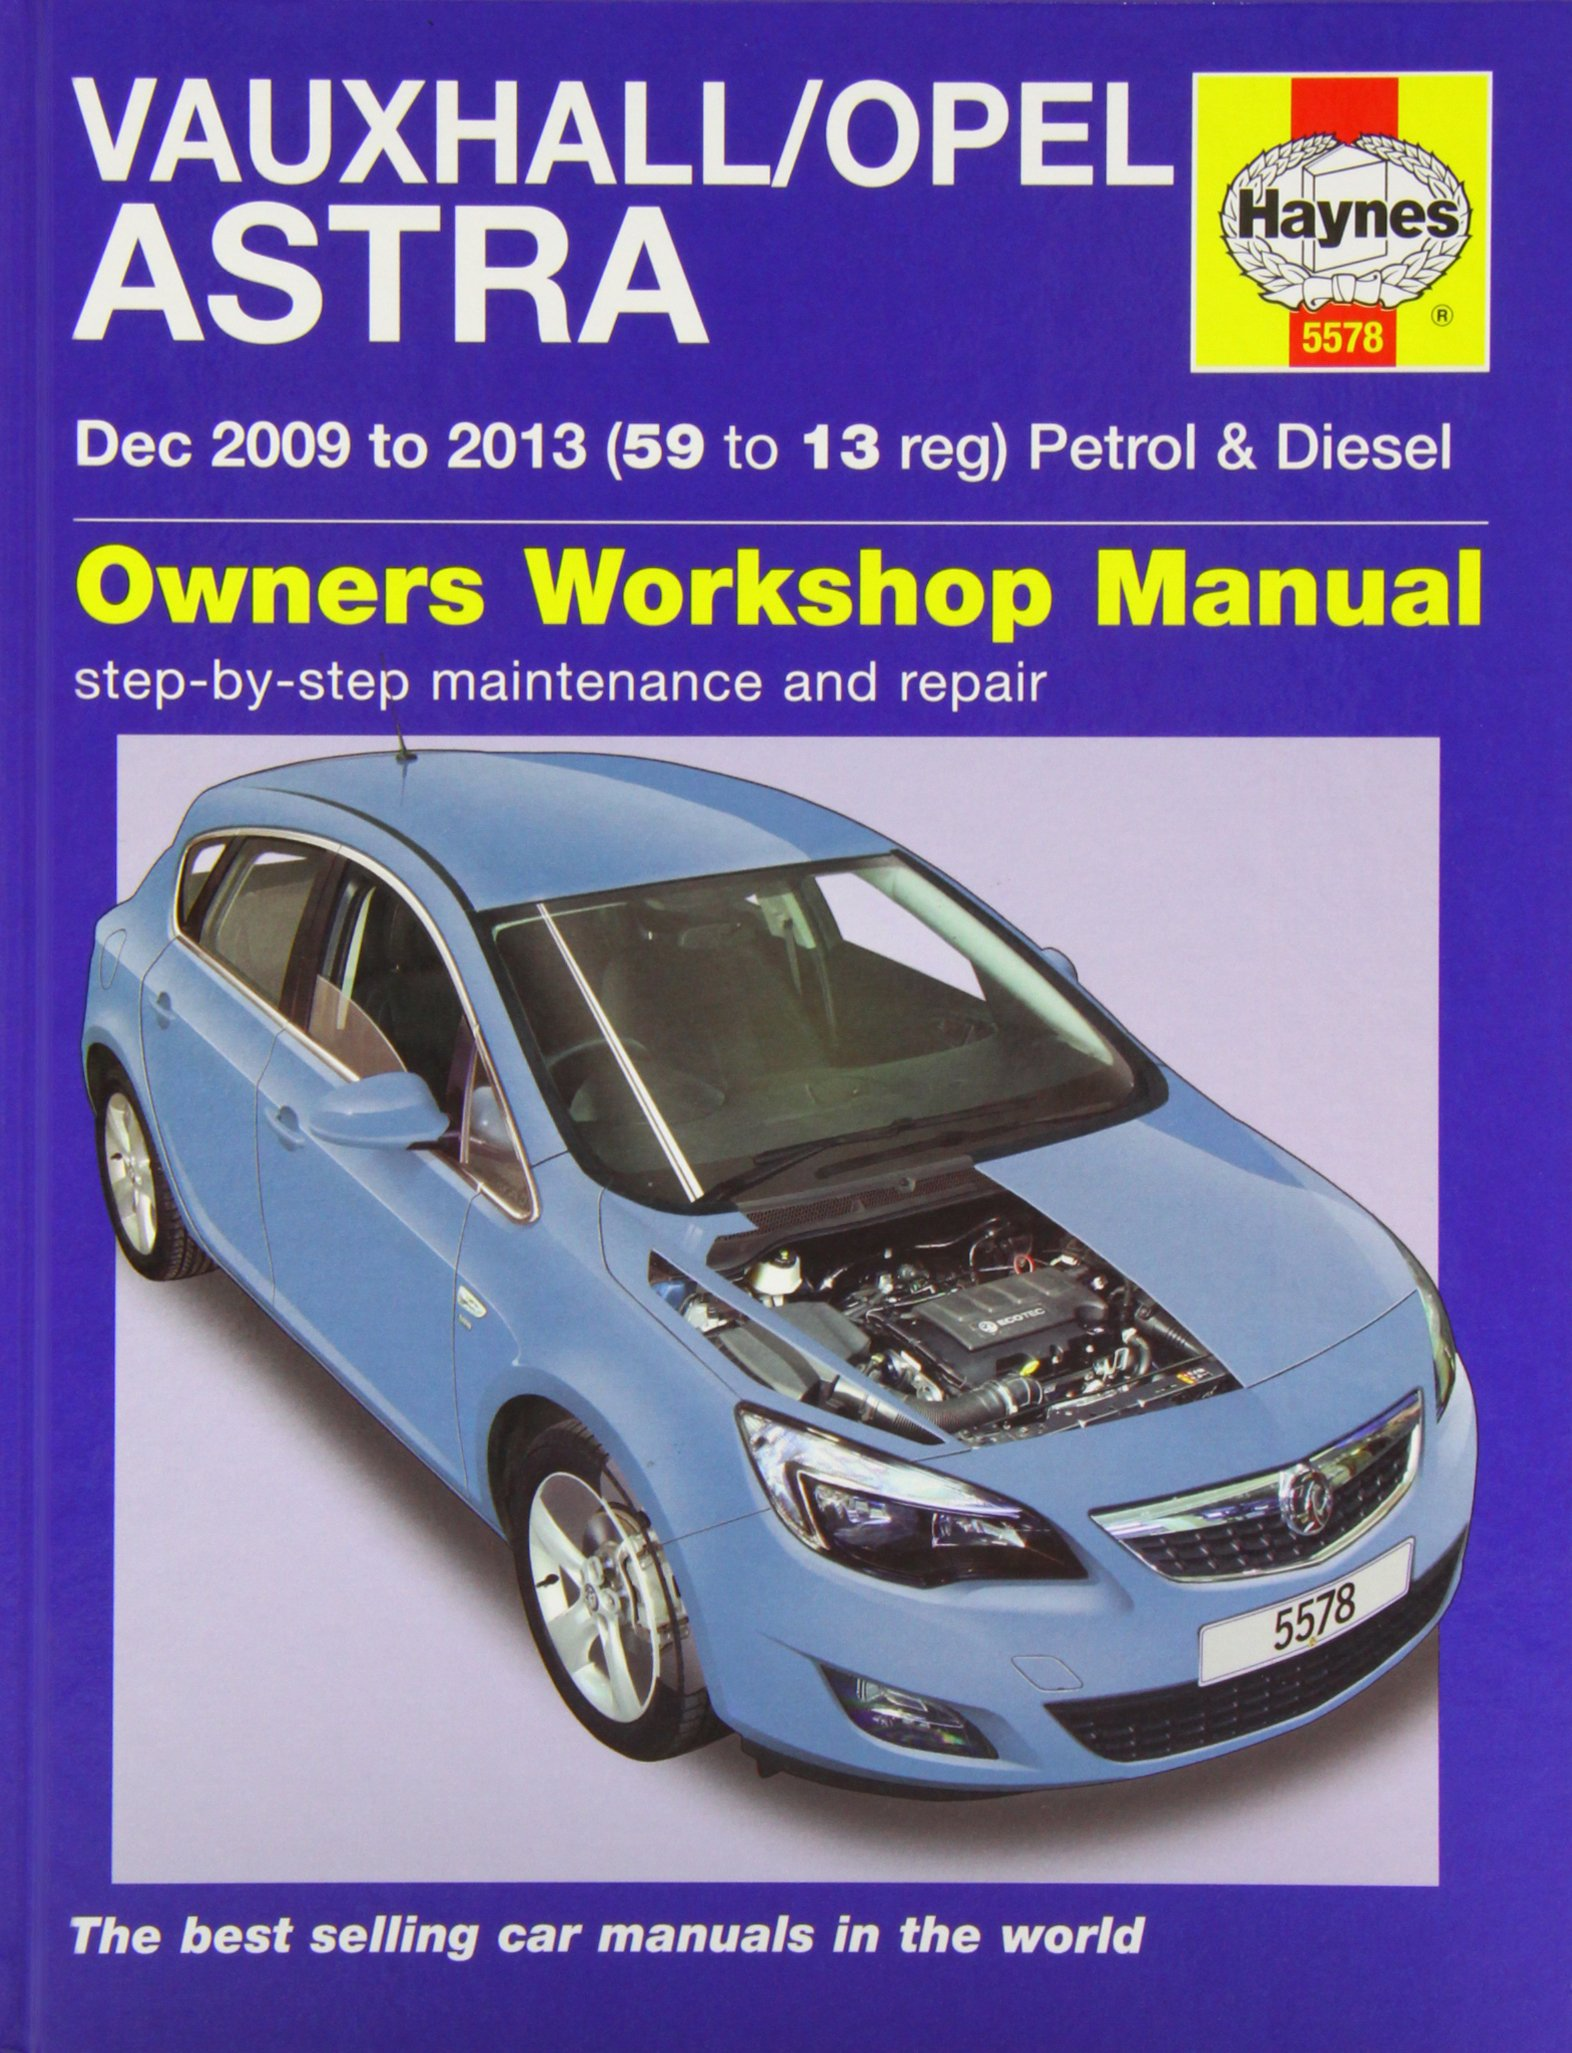 Vauxhall/Opel Astra (Dec 09 - 13) 59 To 13: Amazon.es: John S. Mead: Libros en idiomas extranjeros